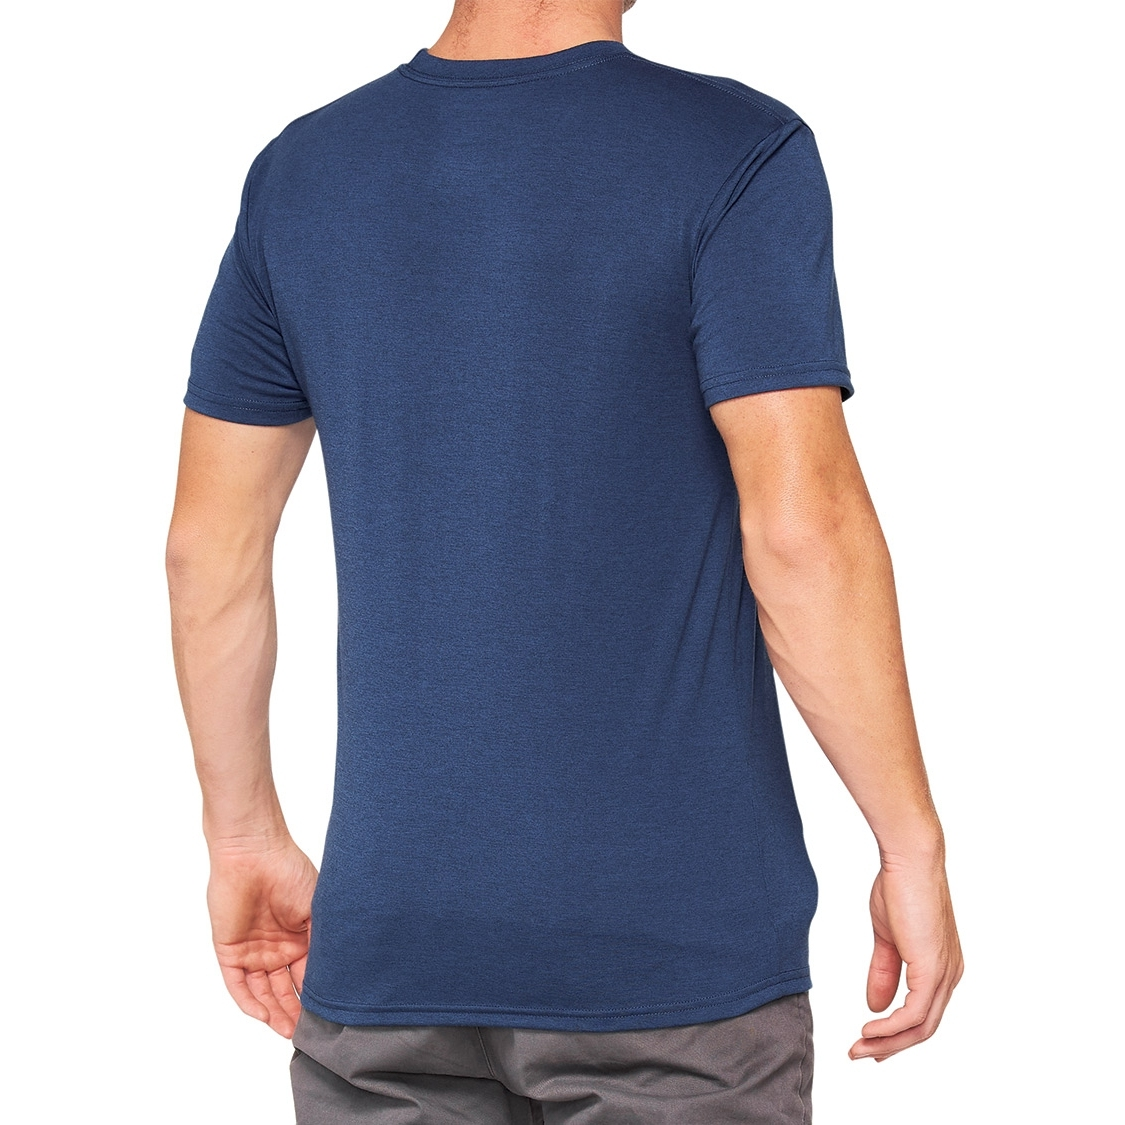 Imagen de 100% Cropped Tech Camisa - navy